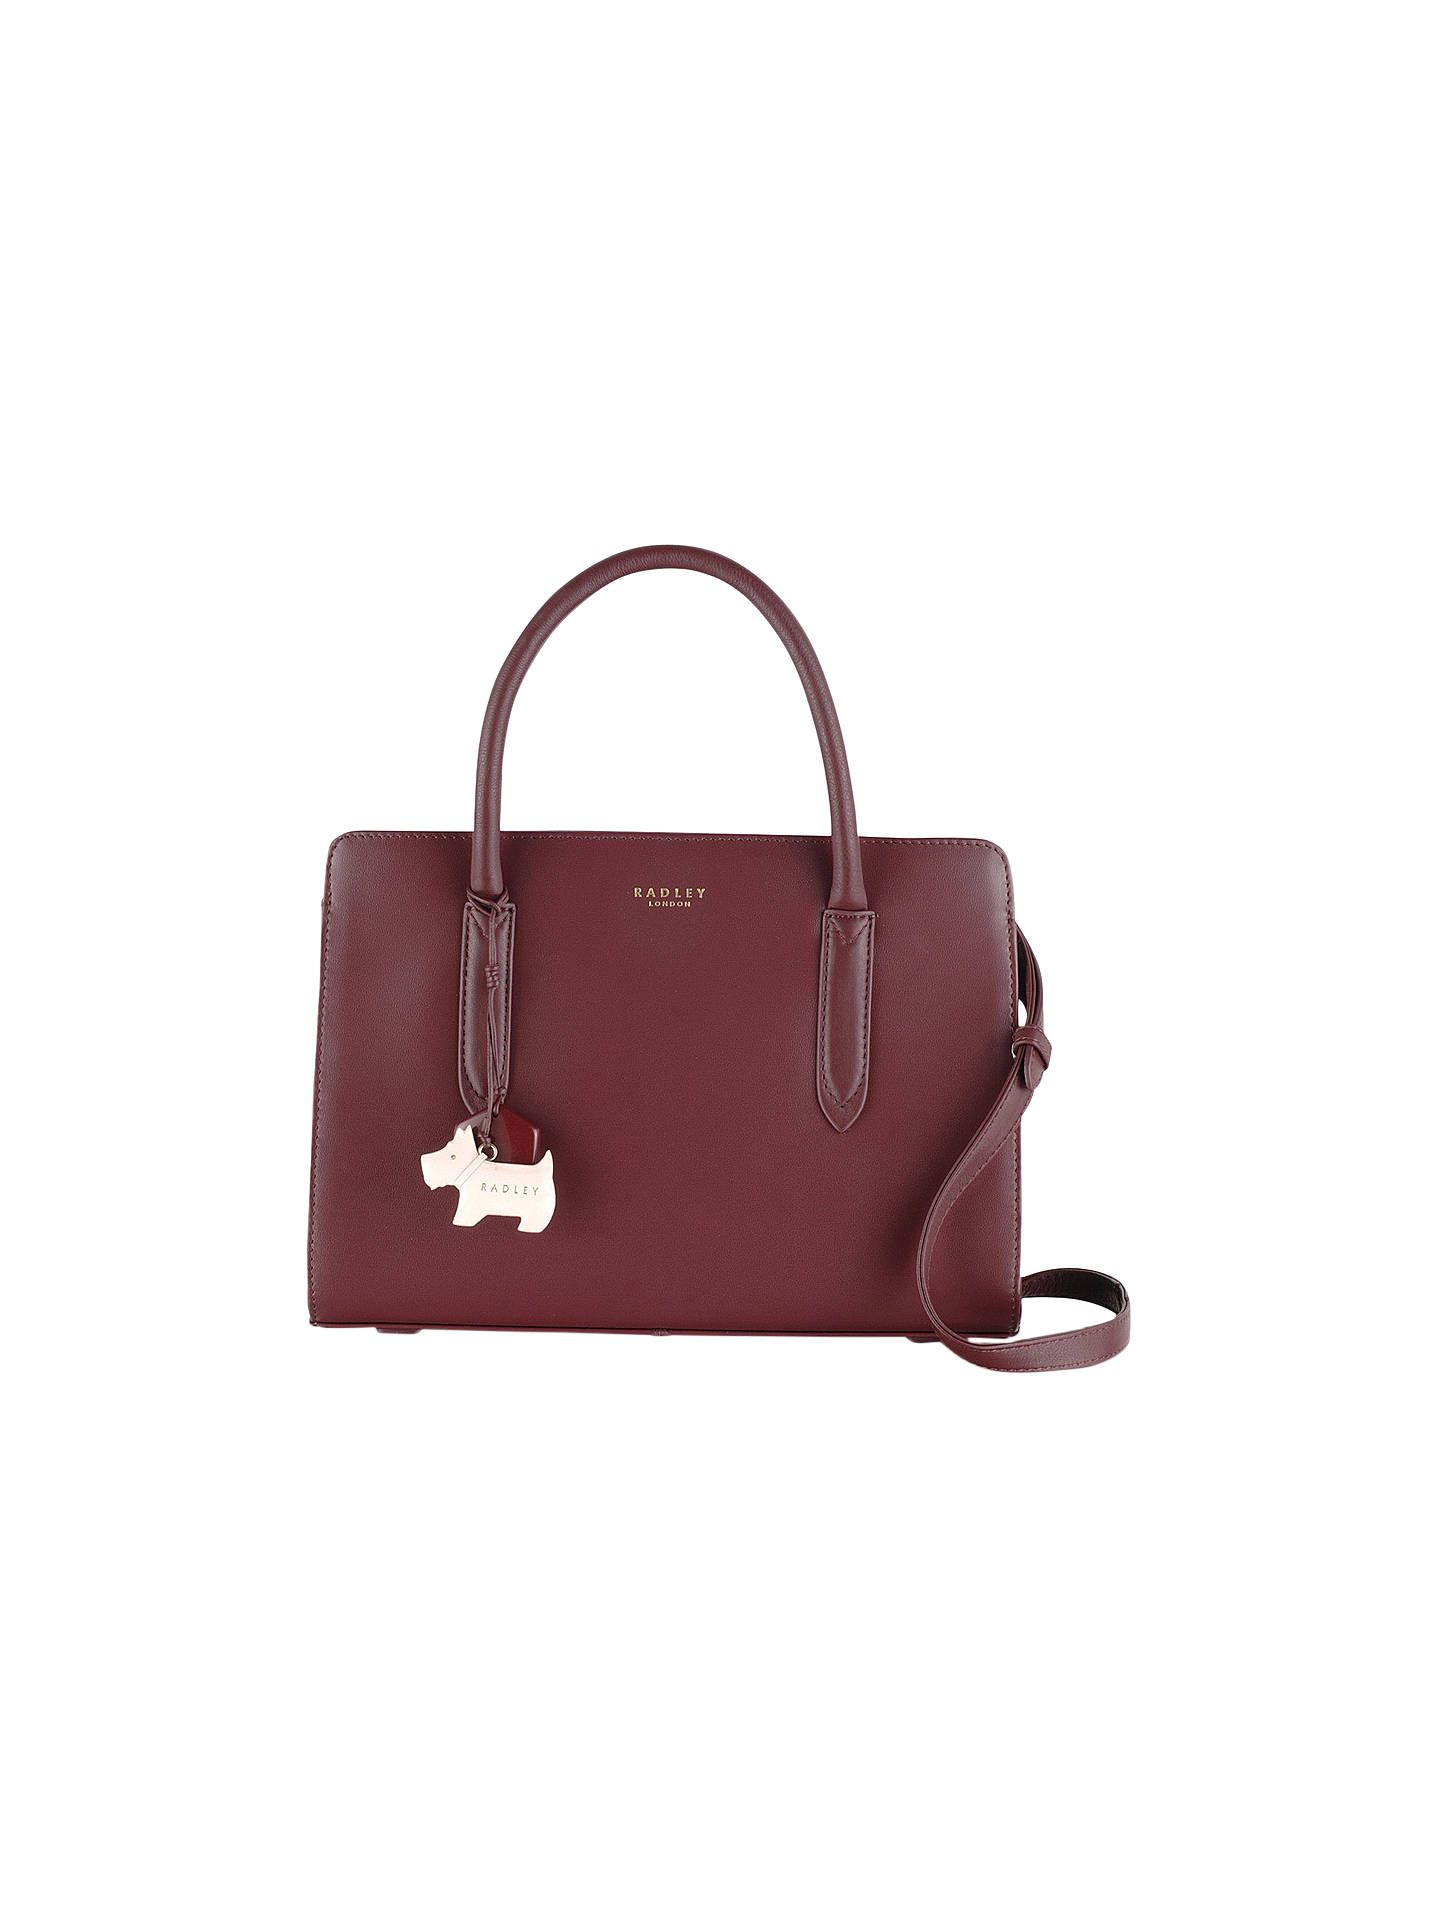 Radley Liverpool Street Medium Leather Grab Bag, Burgundy by Radley